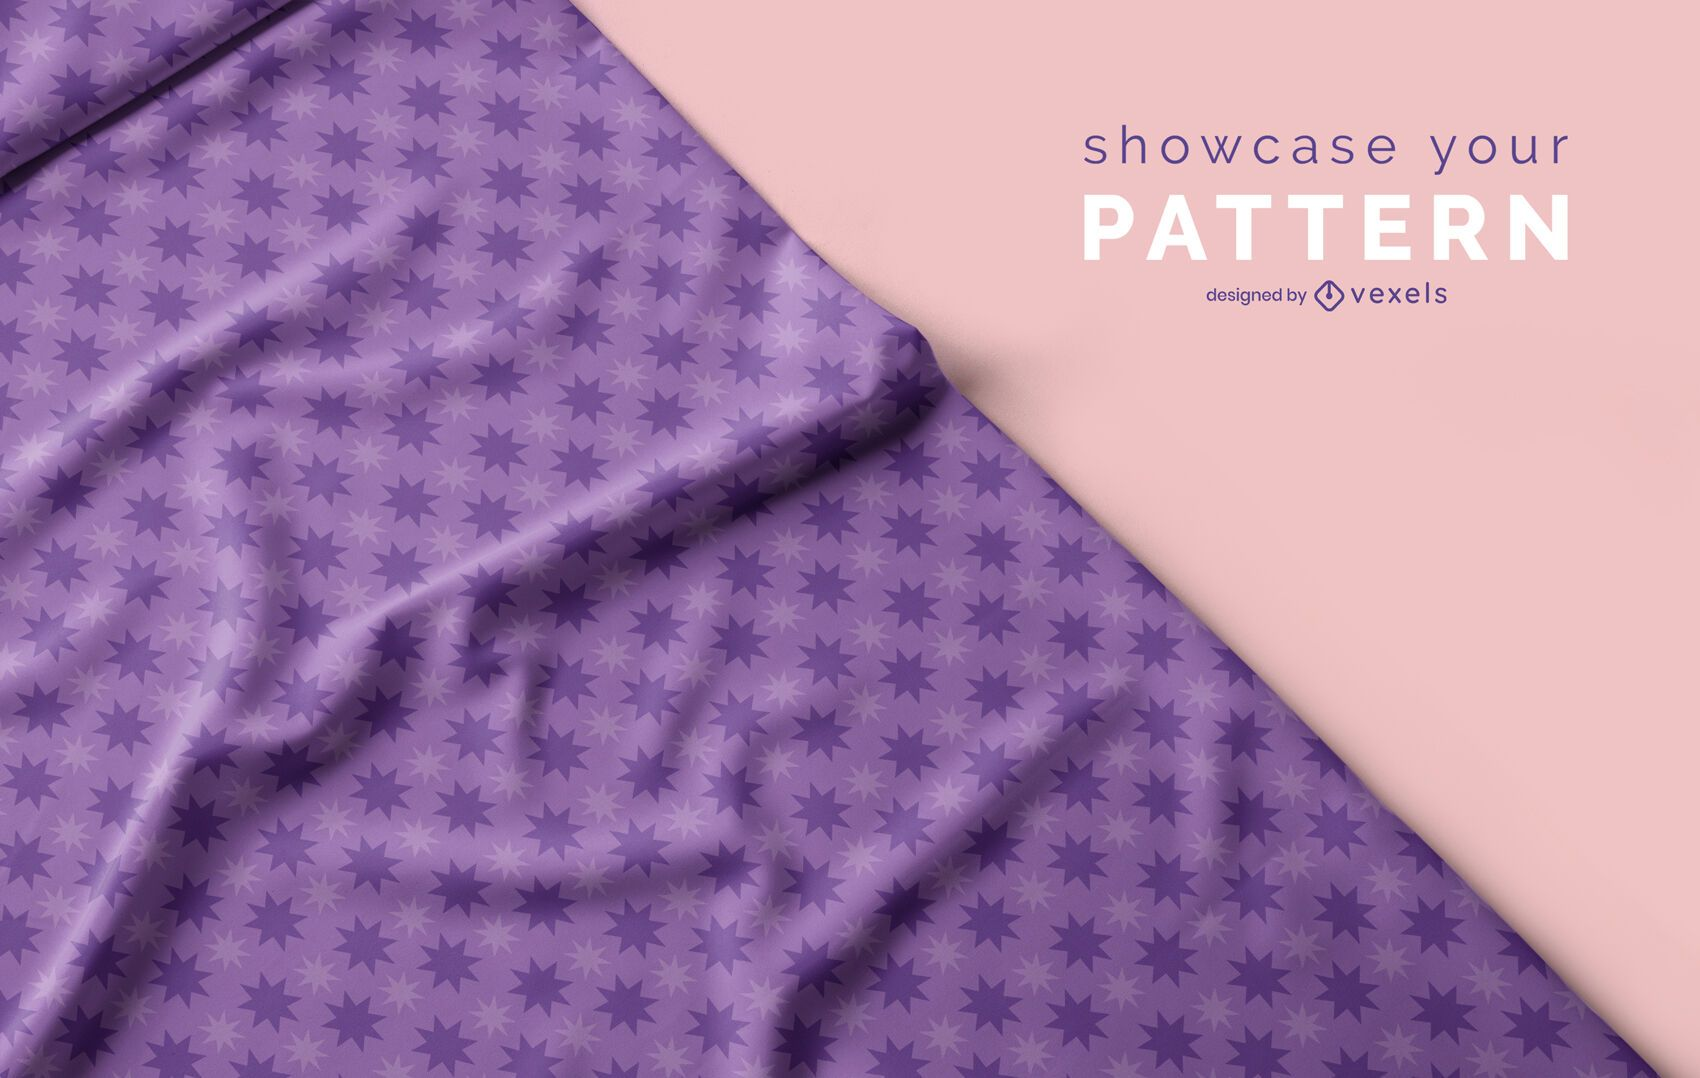 Diseño de maqueta de patrón de tela psd